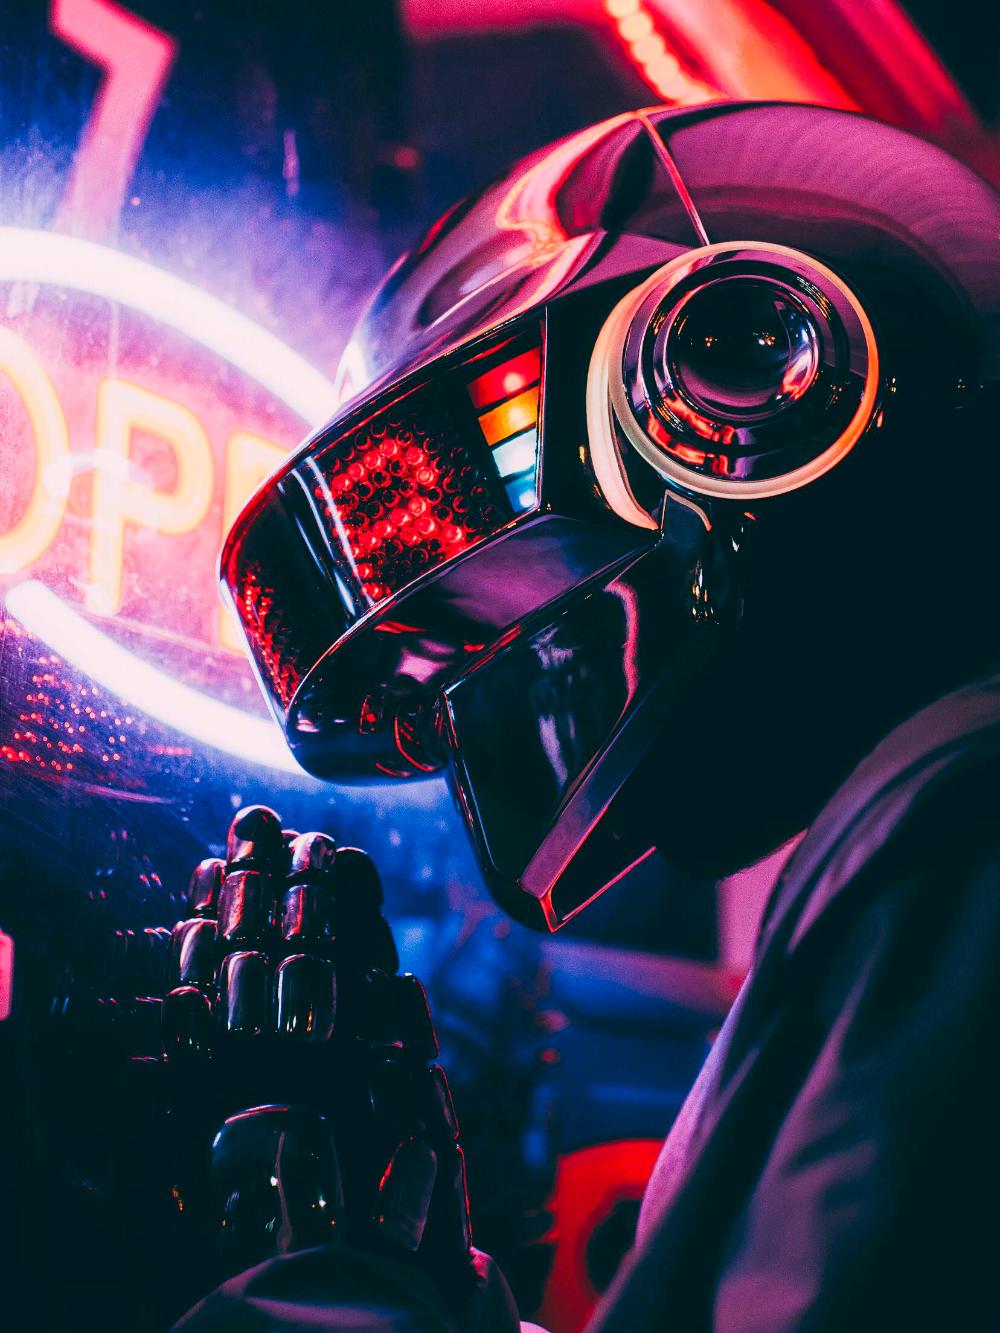 Thomas Bangalter Cosplay with my brother : DaftPunk in 2020 | Thomas  bangalter, Retro futurism, Cyberpunk aesthetic